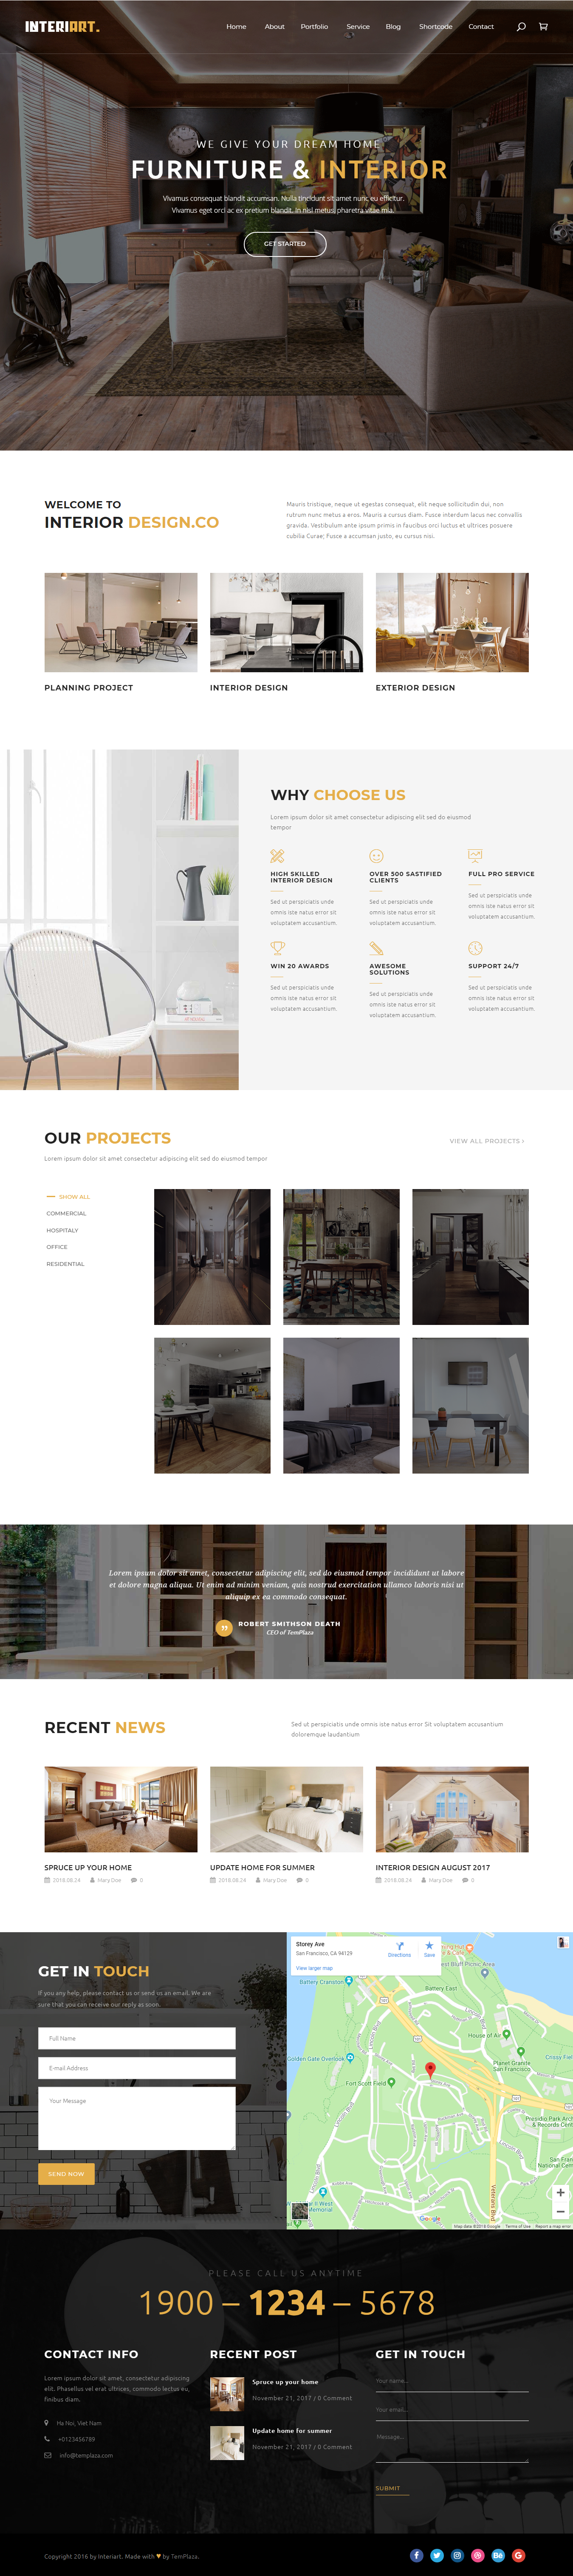 Interiart - Best Premium Interior Design WordPress Theme